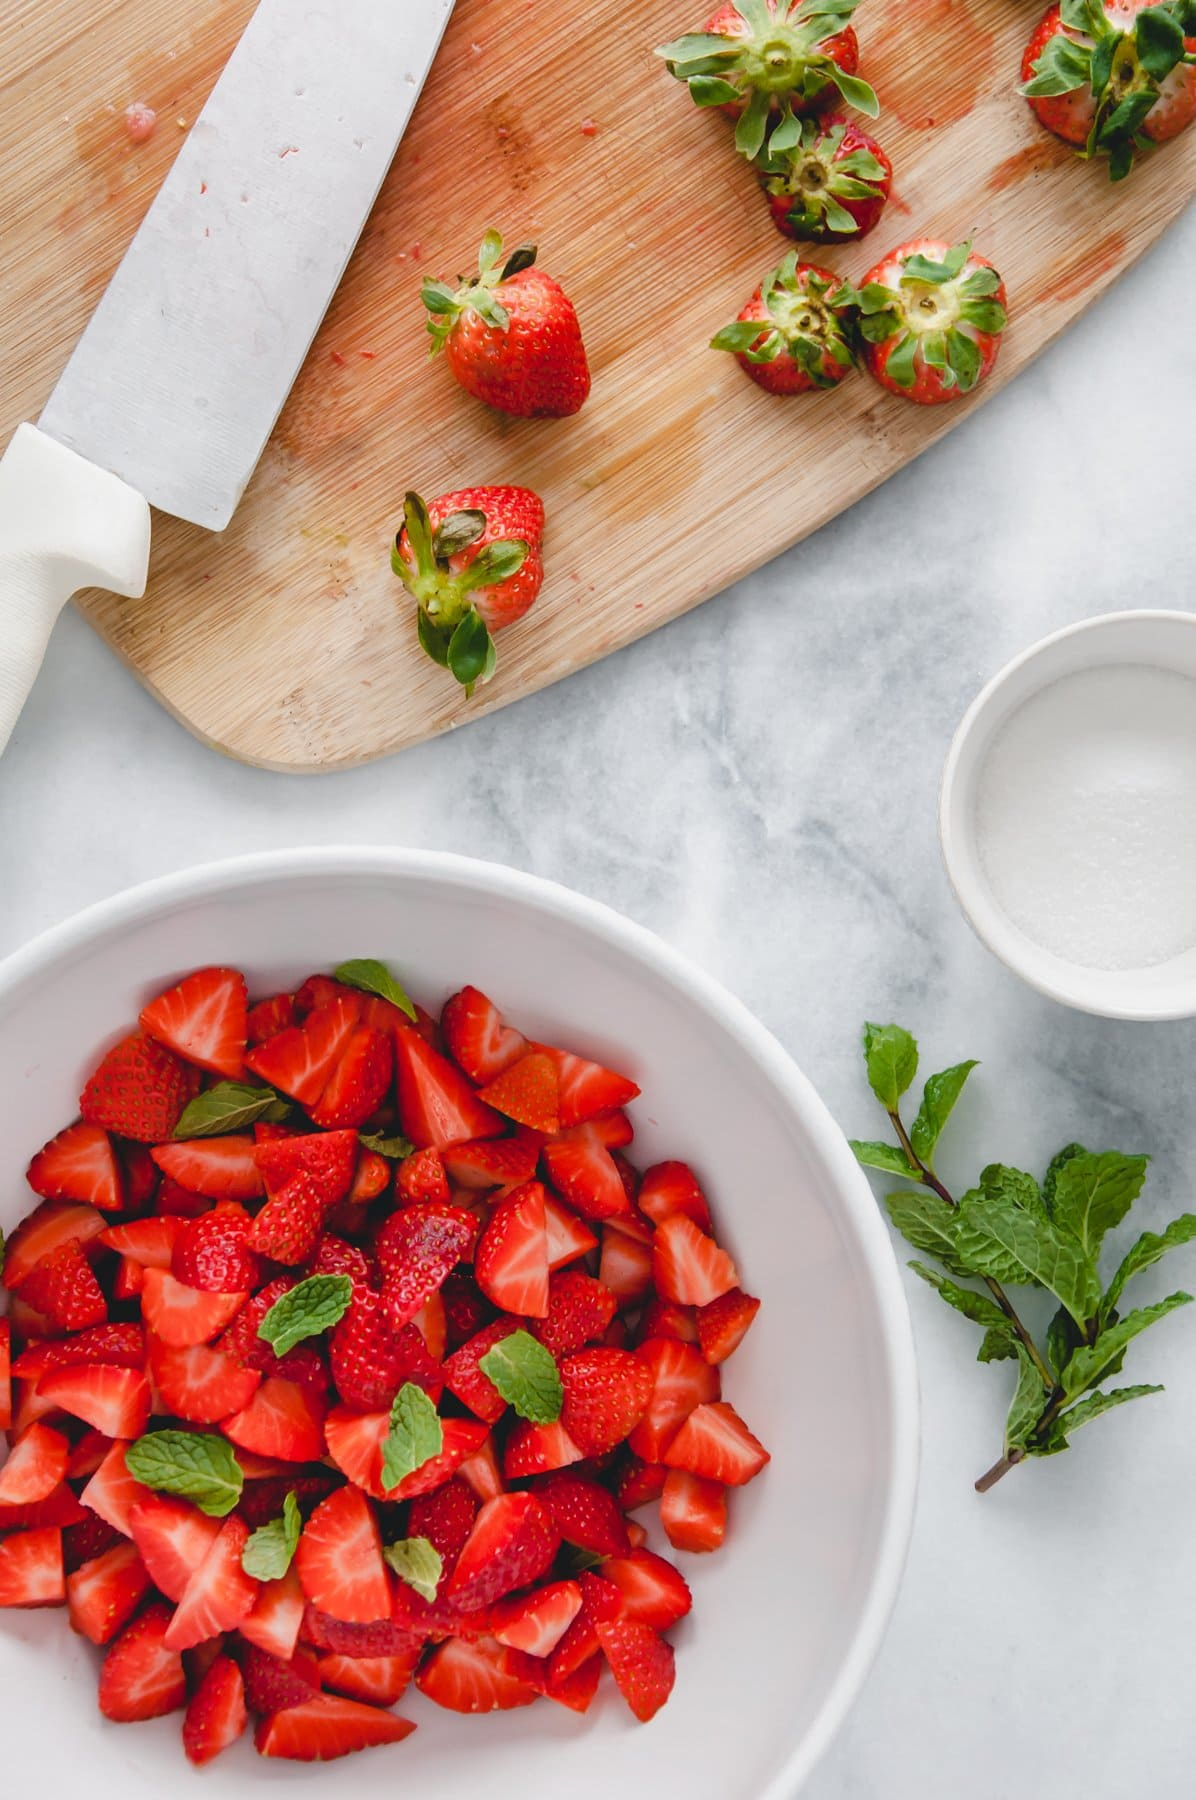 preparing strawberries